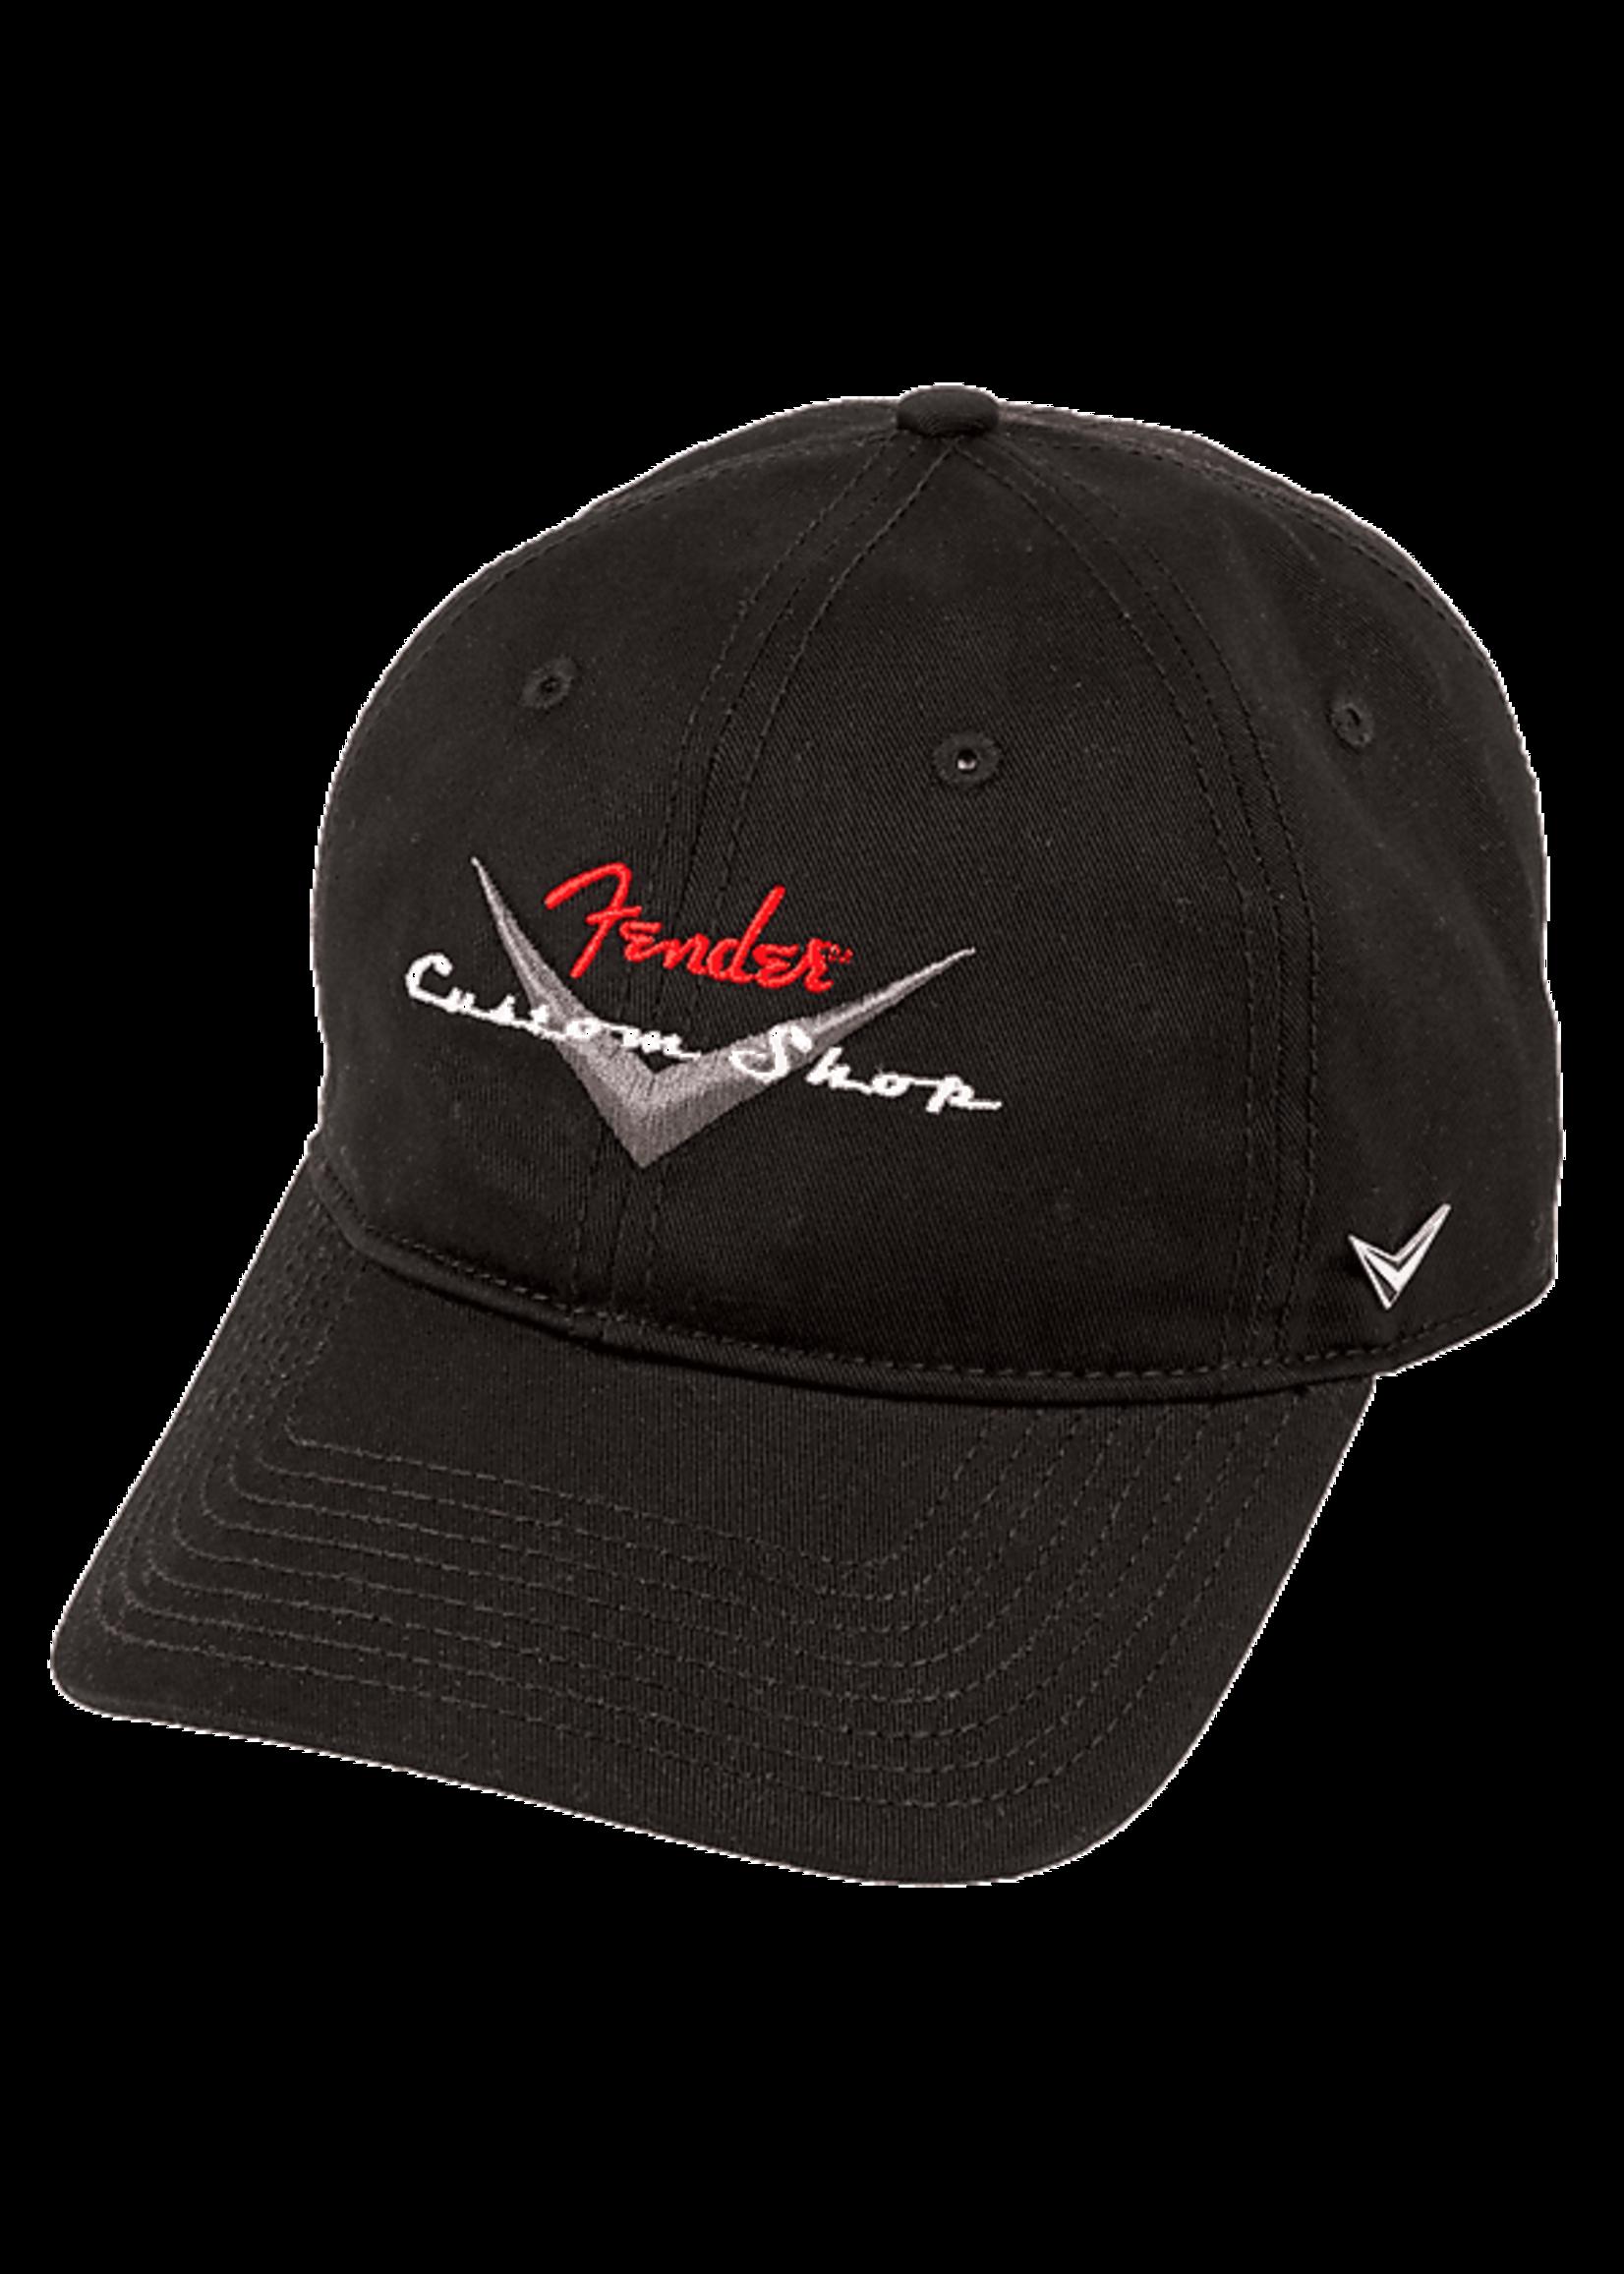 Fender Fender Custom Shop Baseball Hat, Black, One Size Fits Most